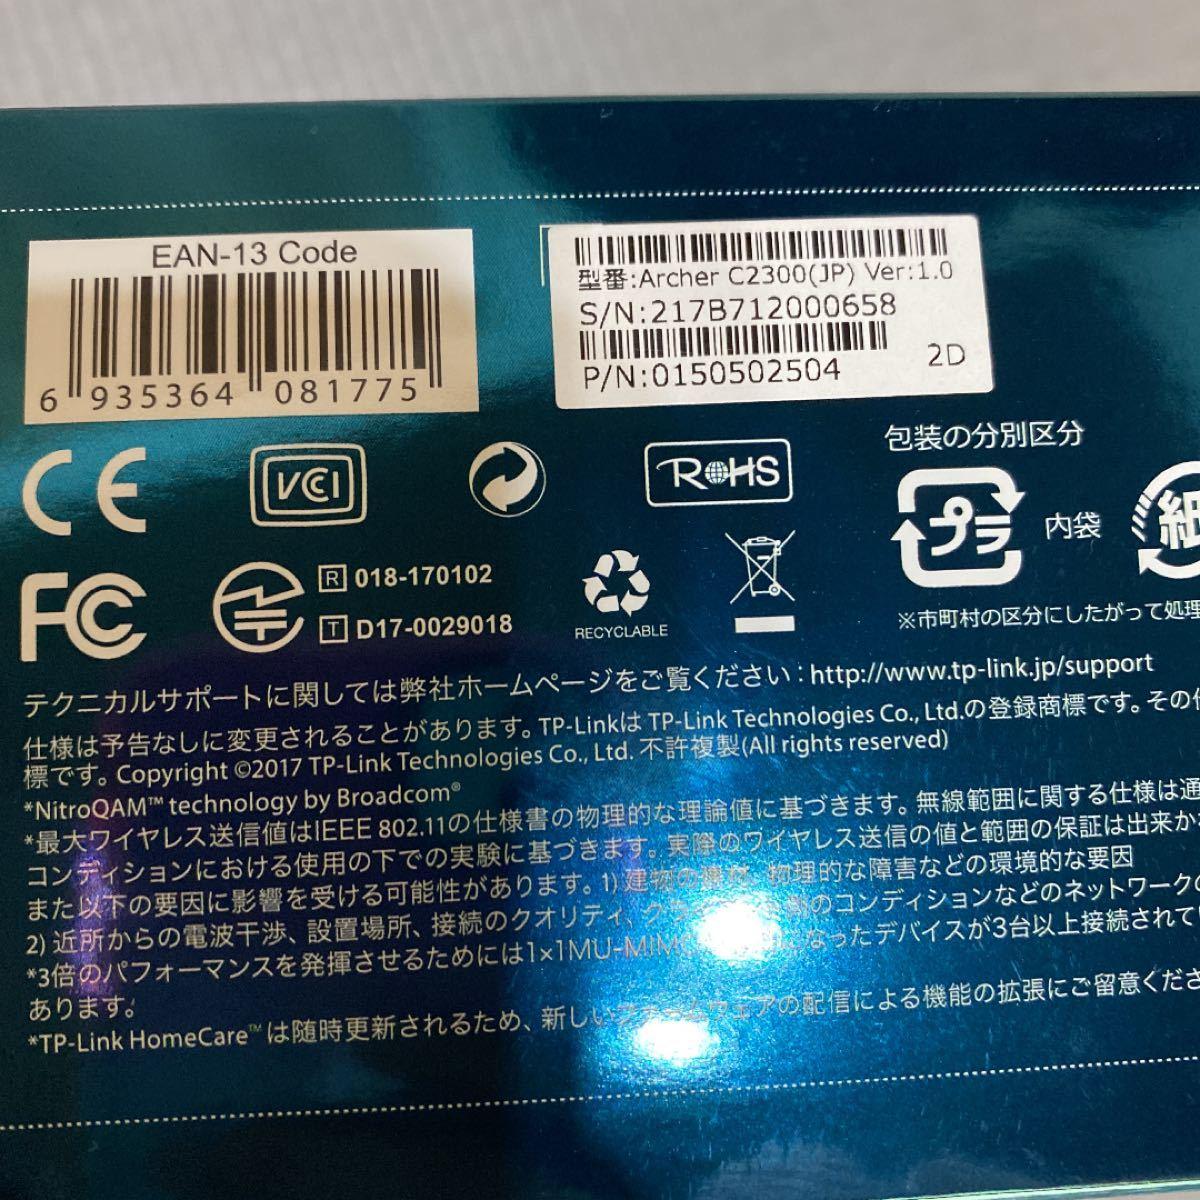 TP-Link Wi-Fi 無線LAN ルーター Archer C2300